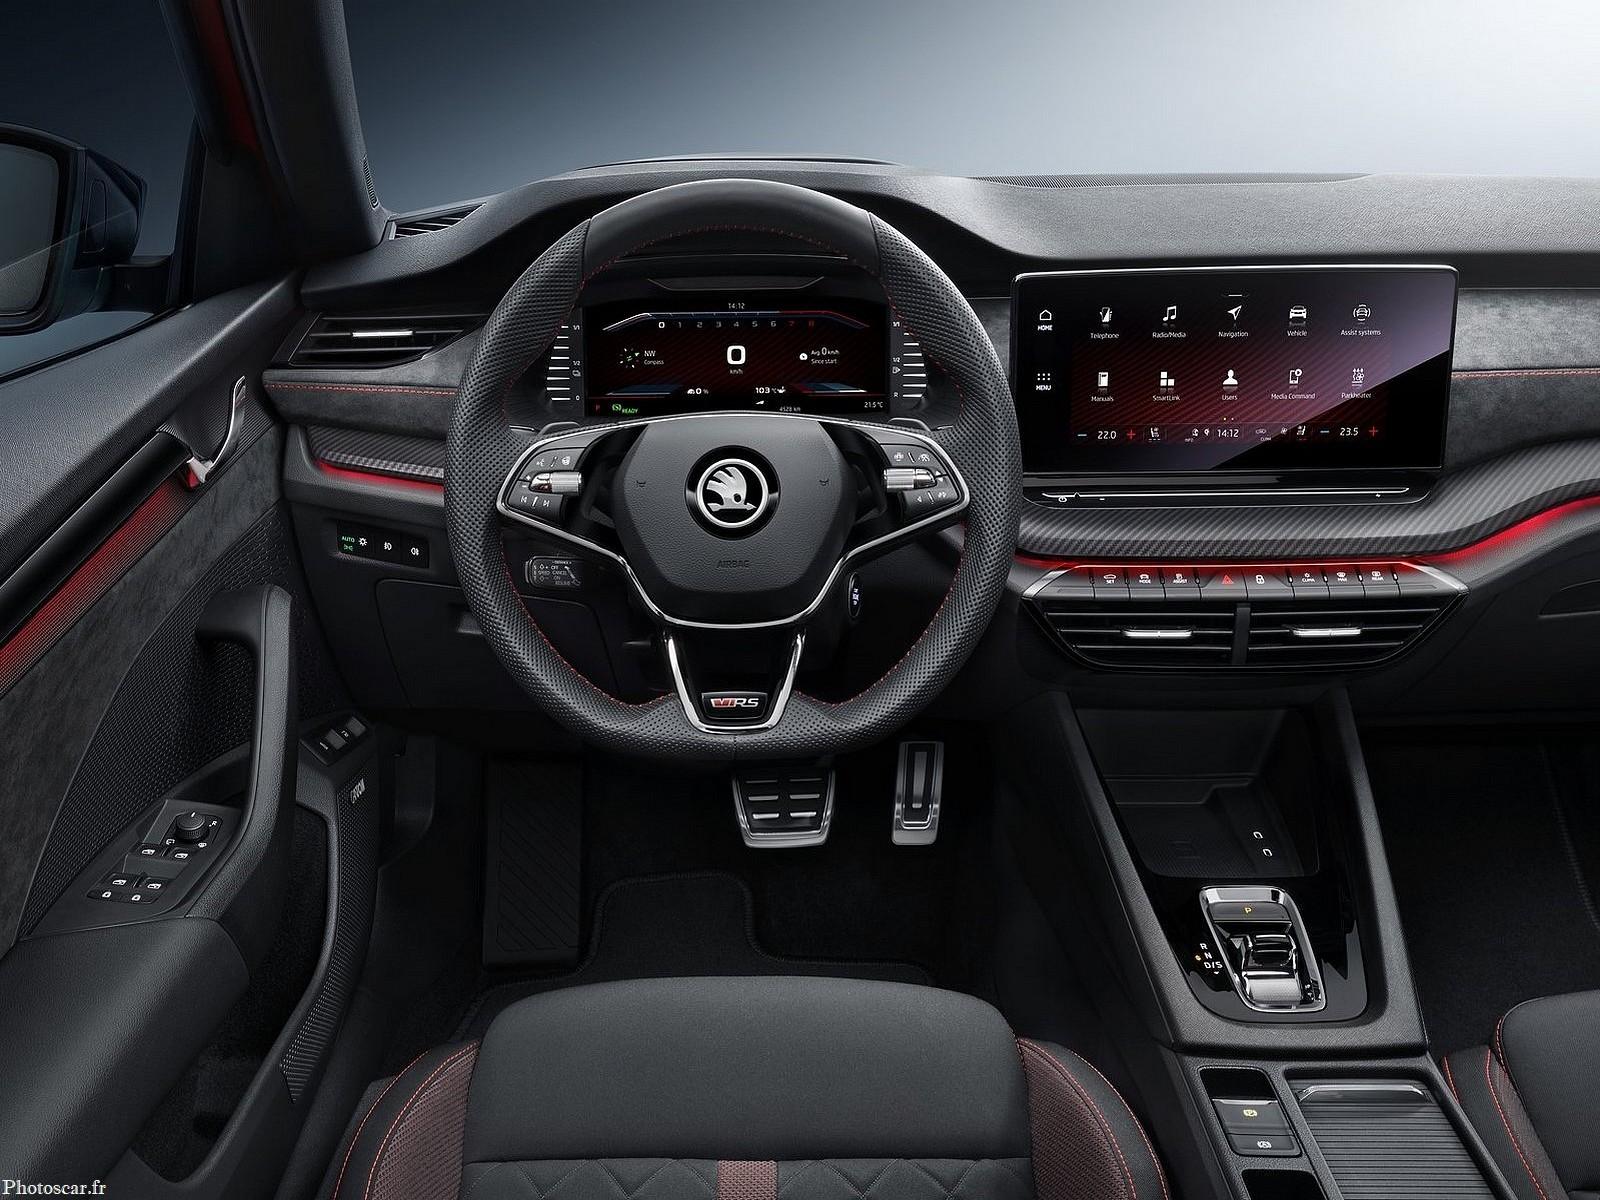 Skoda Octavia RS iV Combi 2020